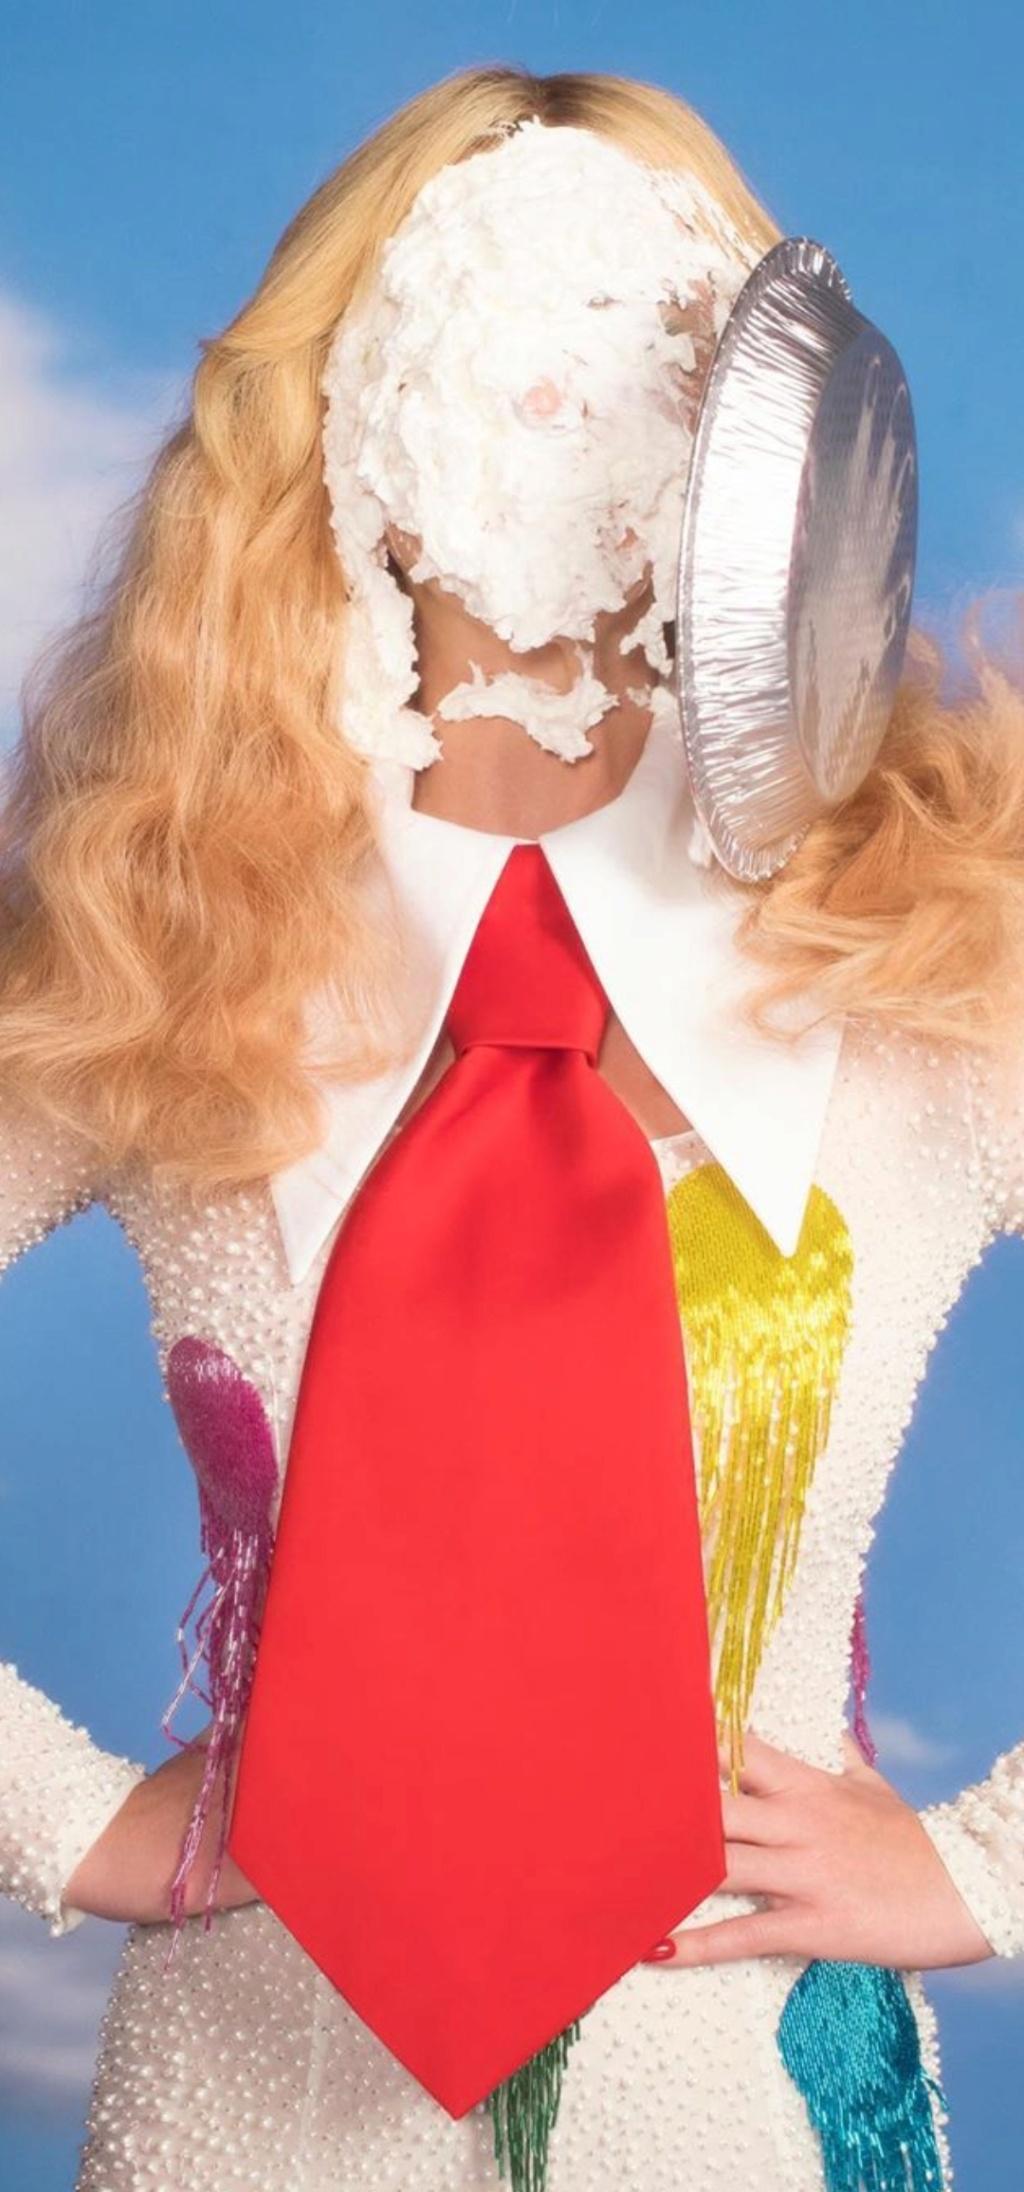 Katy Perry  - Σελίδα 46 Screen22